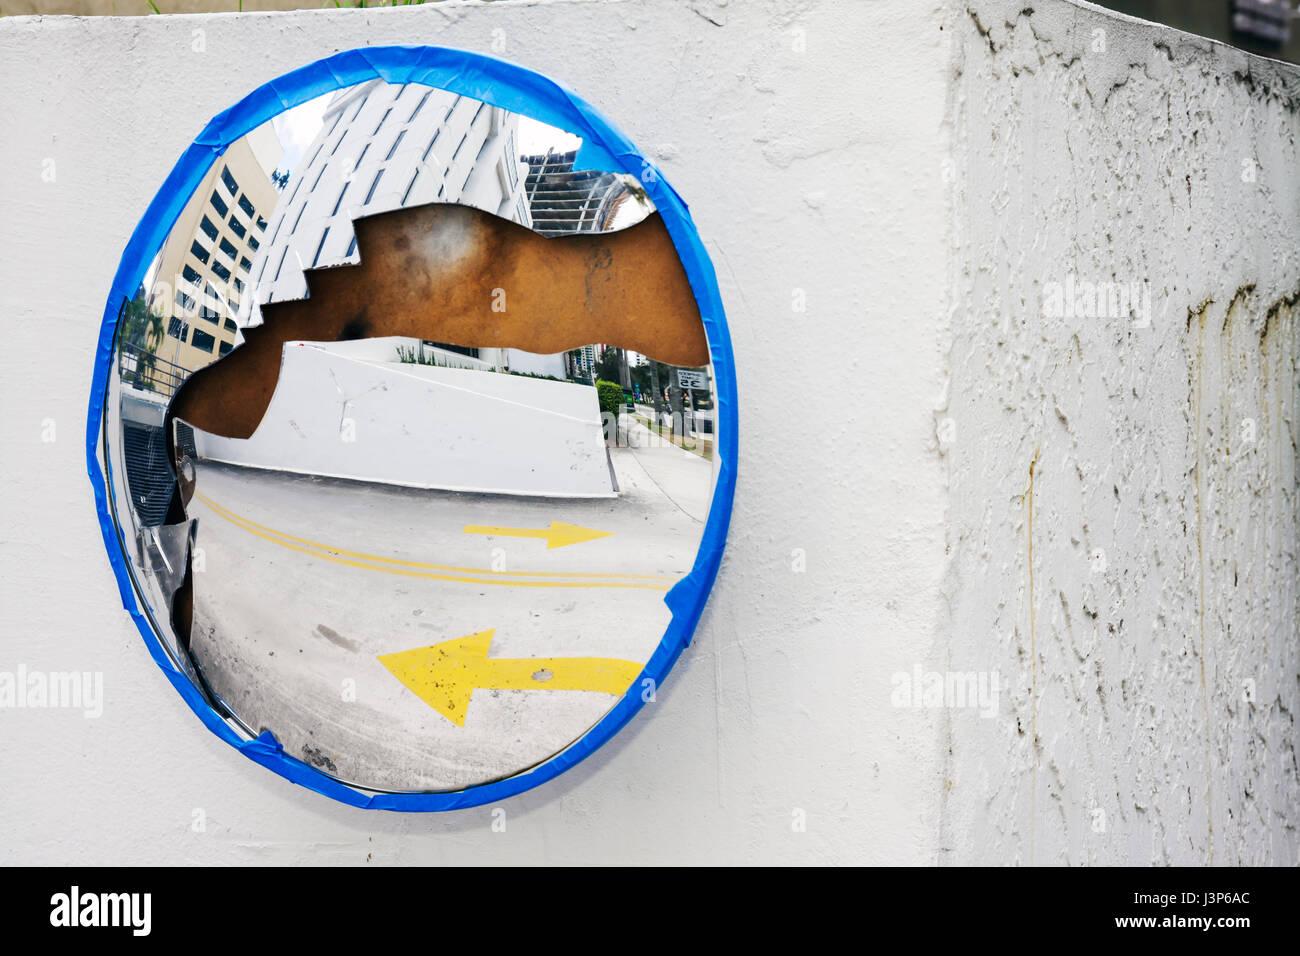 Blind Spot Mirror Stockfotos & Blind Spot Mirror Bilder - Alamy